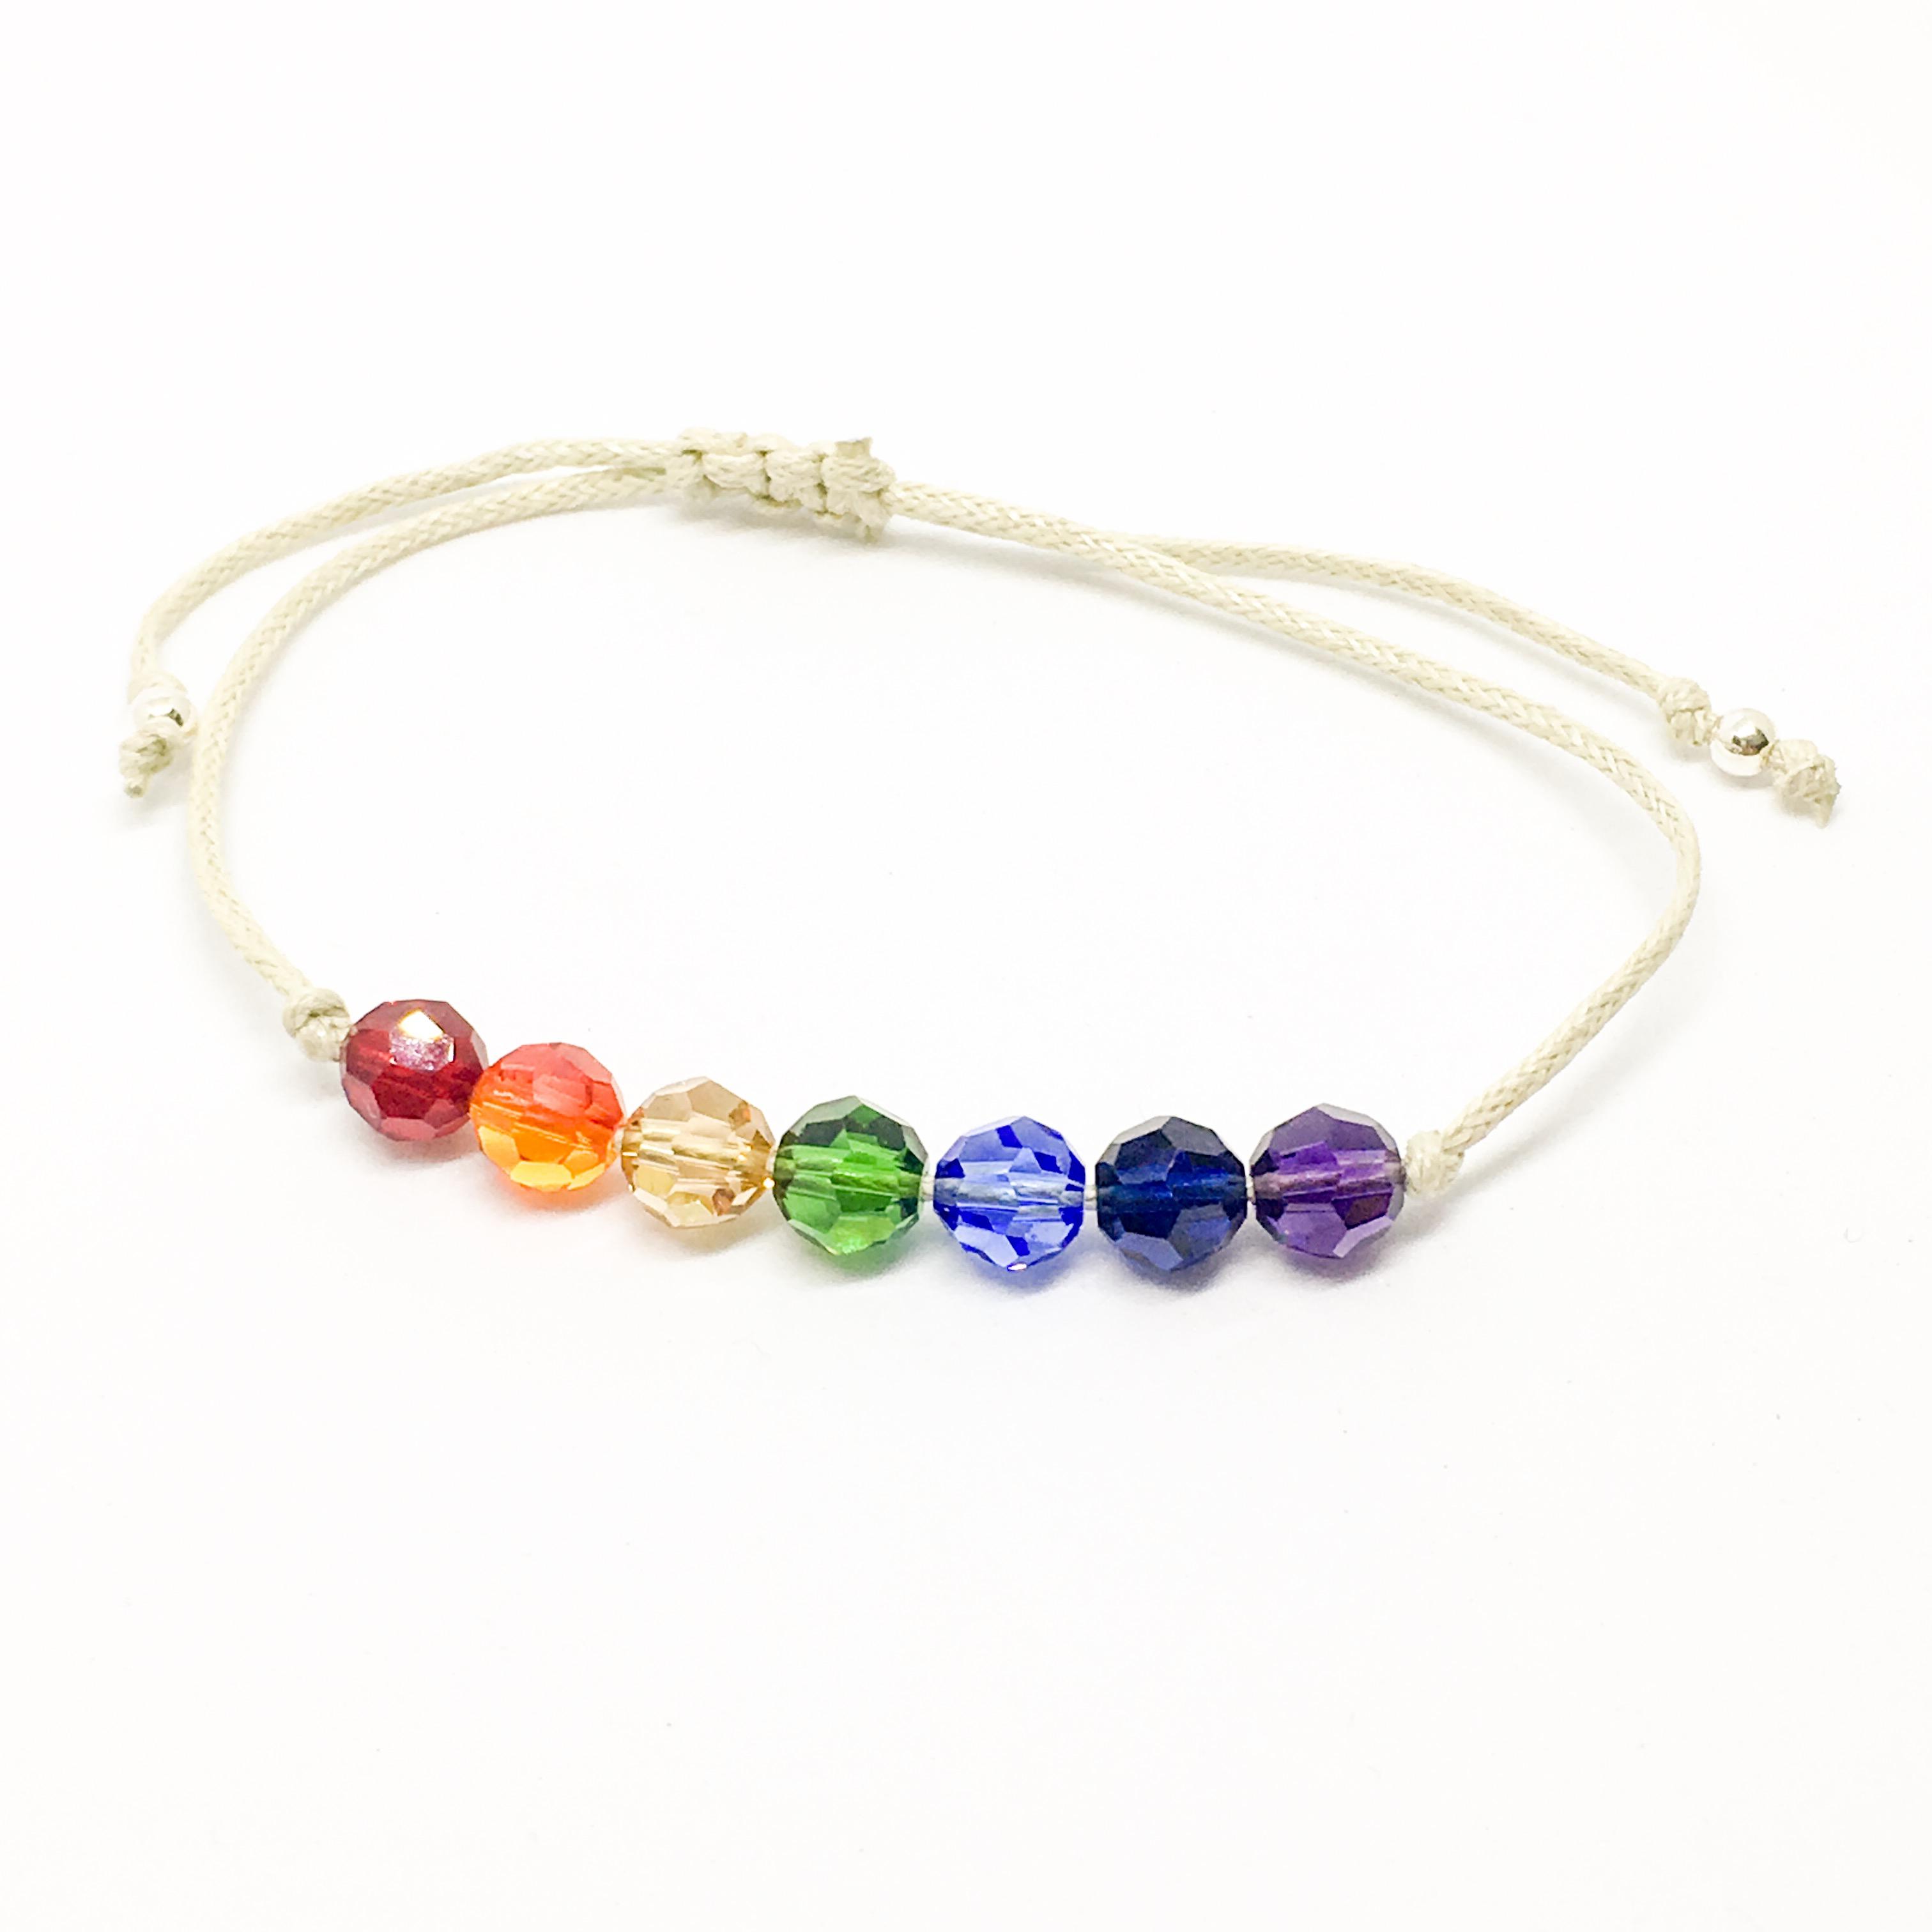 Rainbow chakra friendship bracelet, Swarovski and sterling silver